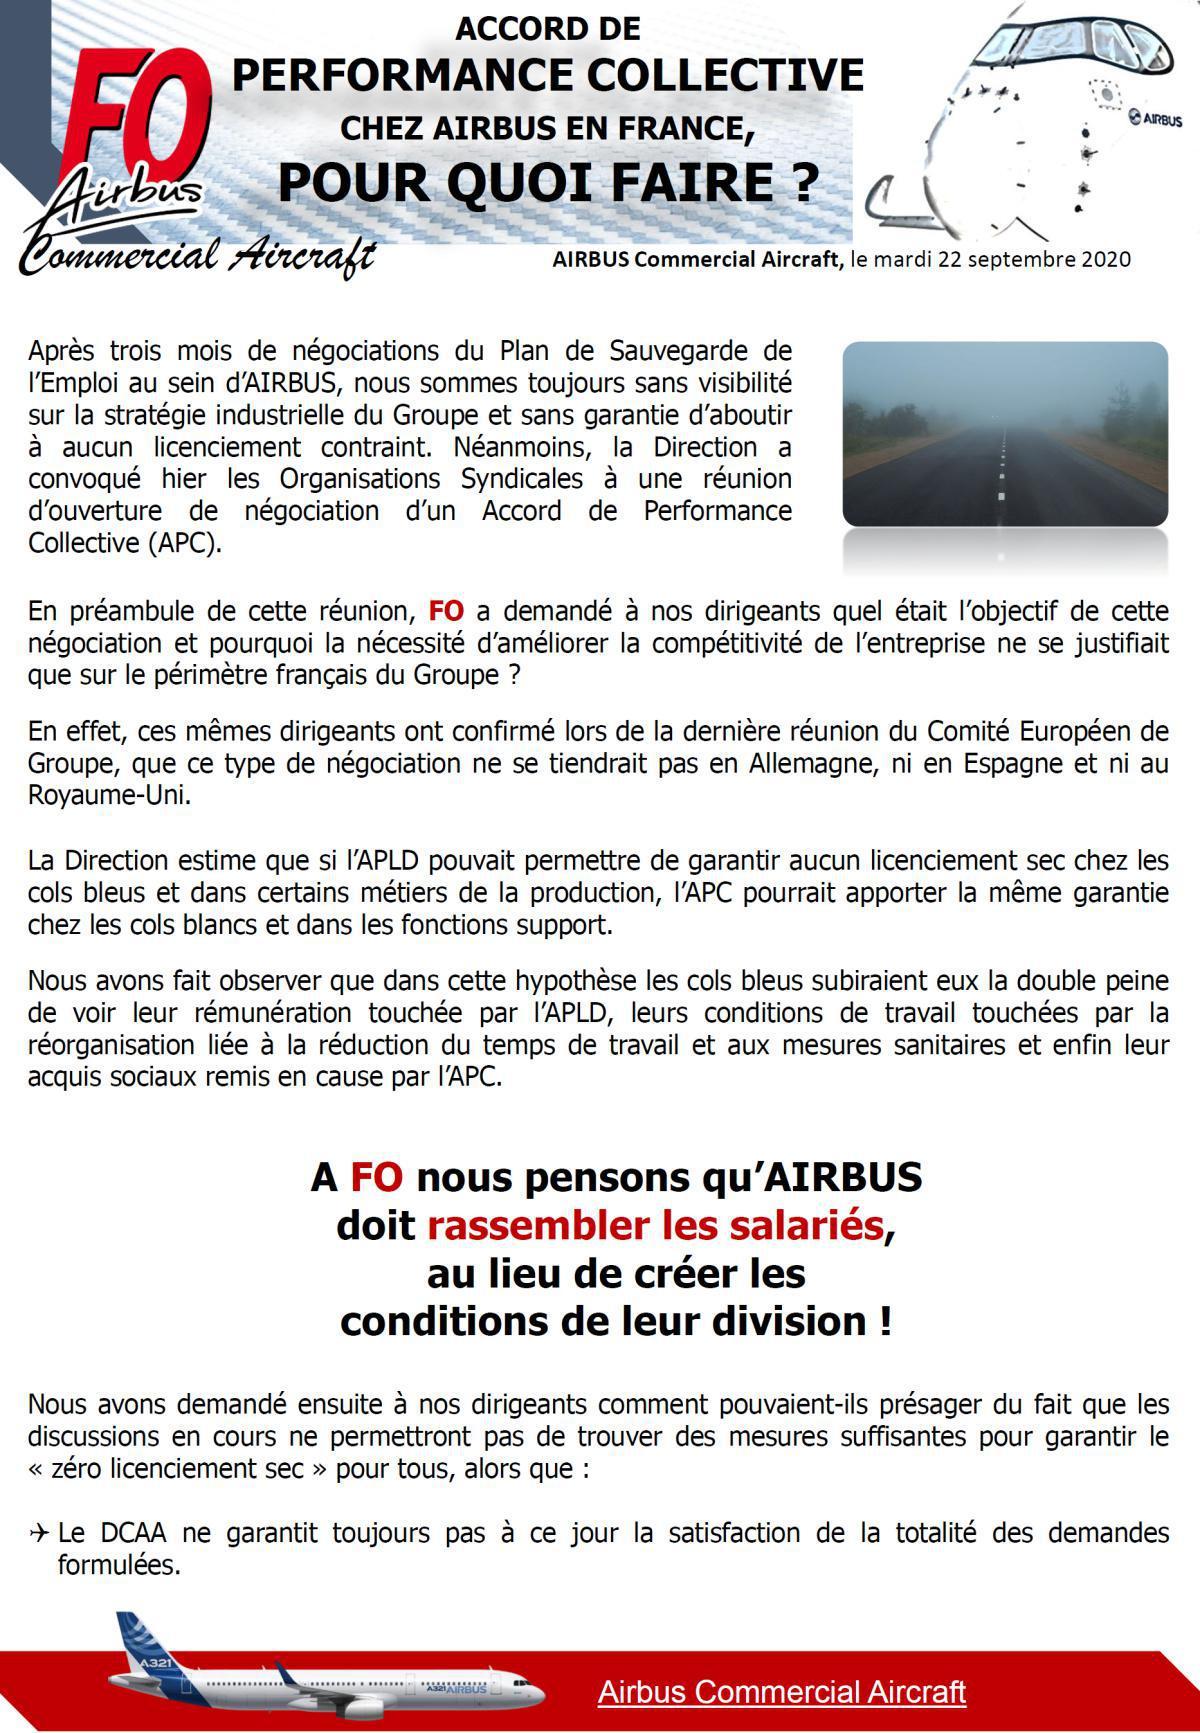 Accord de Performance Collective (APC)